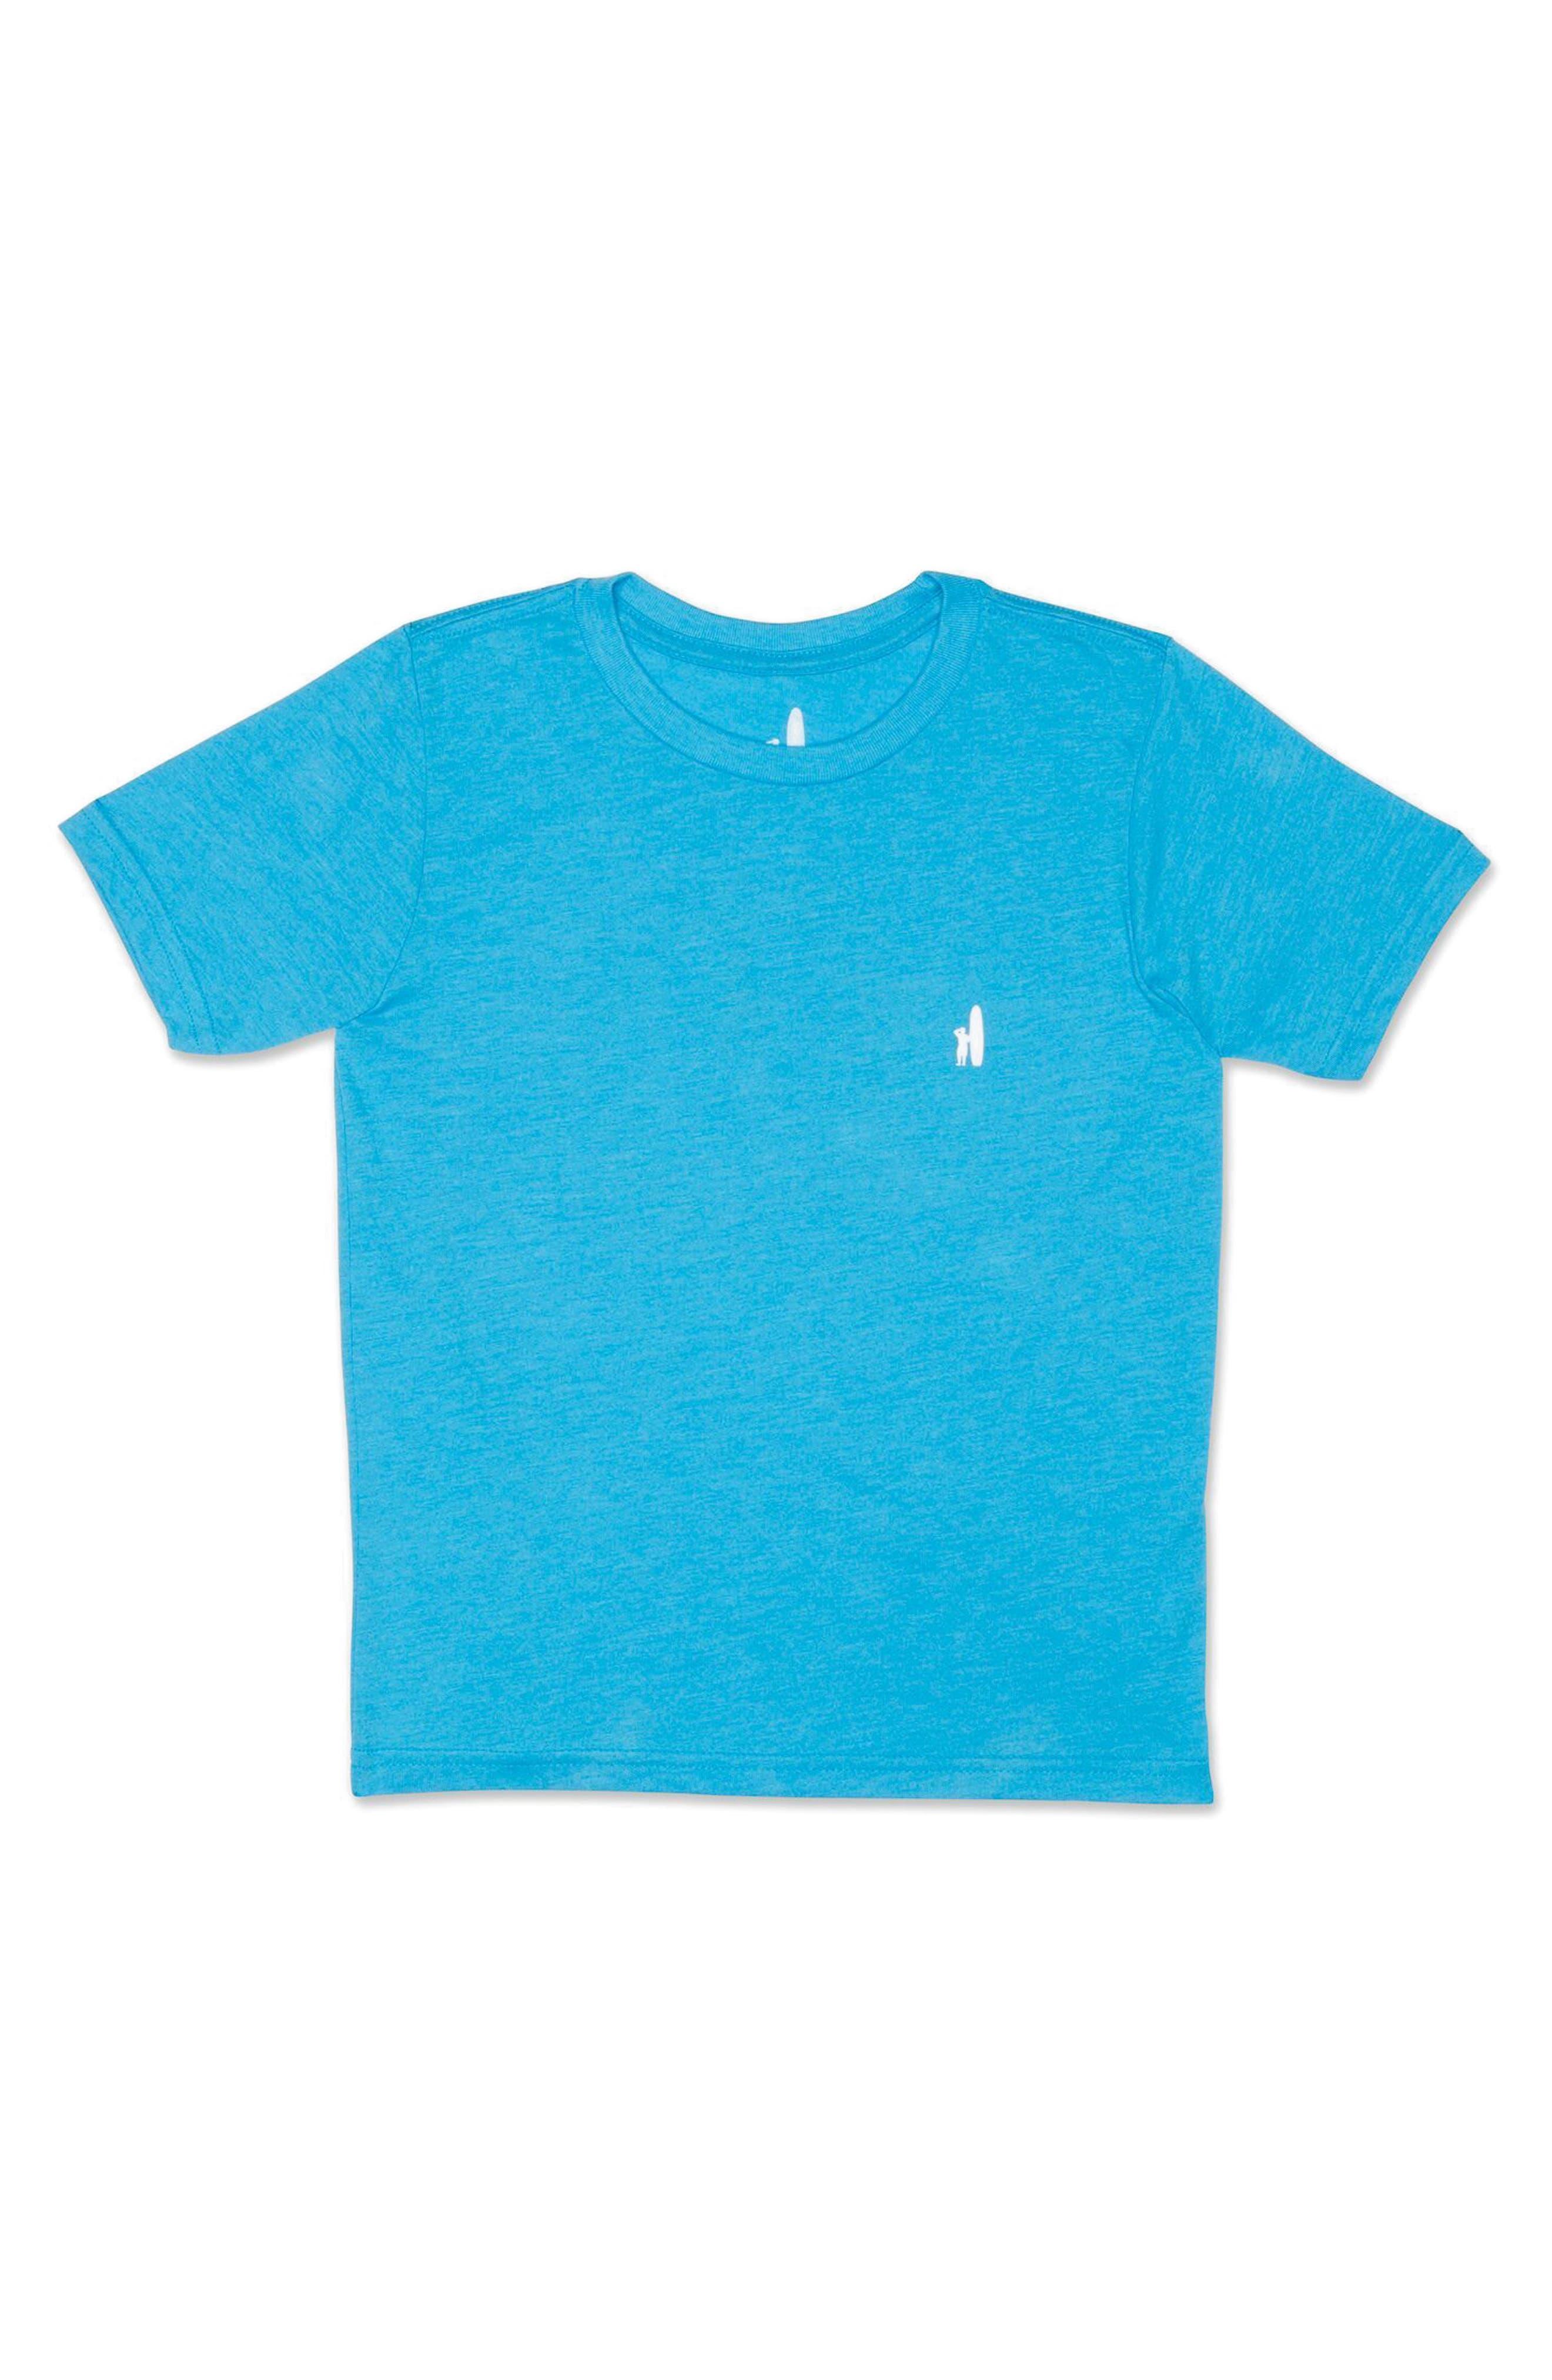 Vance T-Shirt,                             Main thumbnail 1, color,                             Cayman